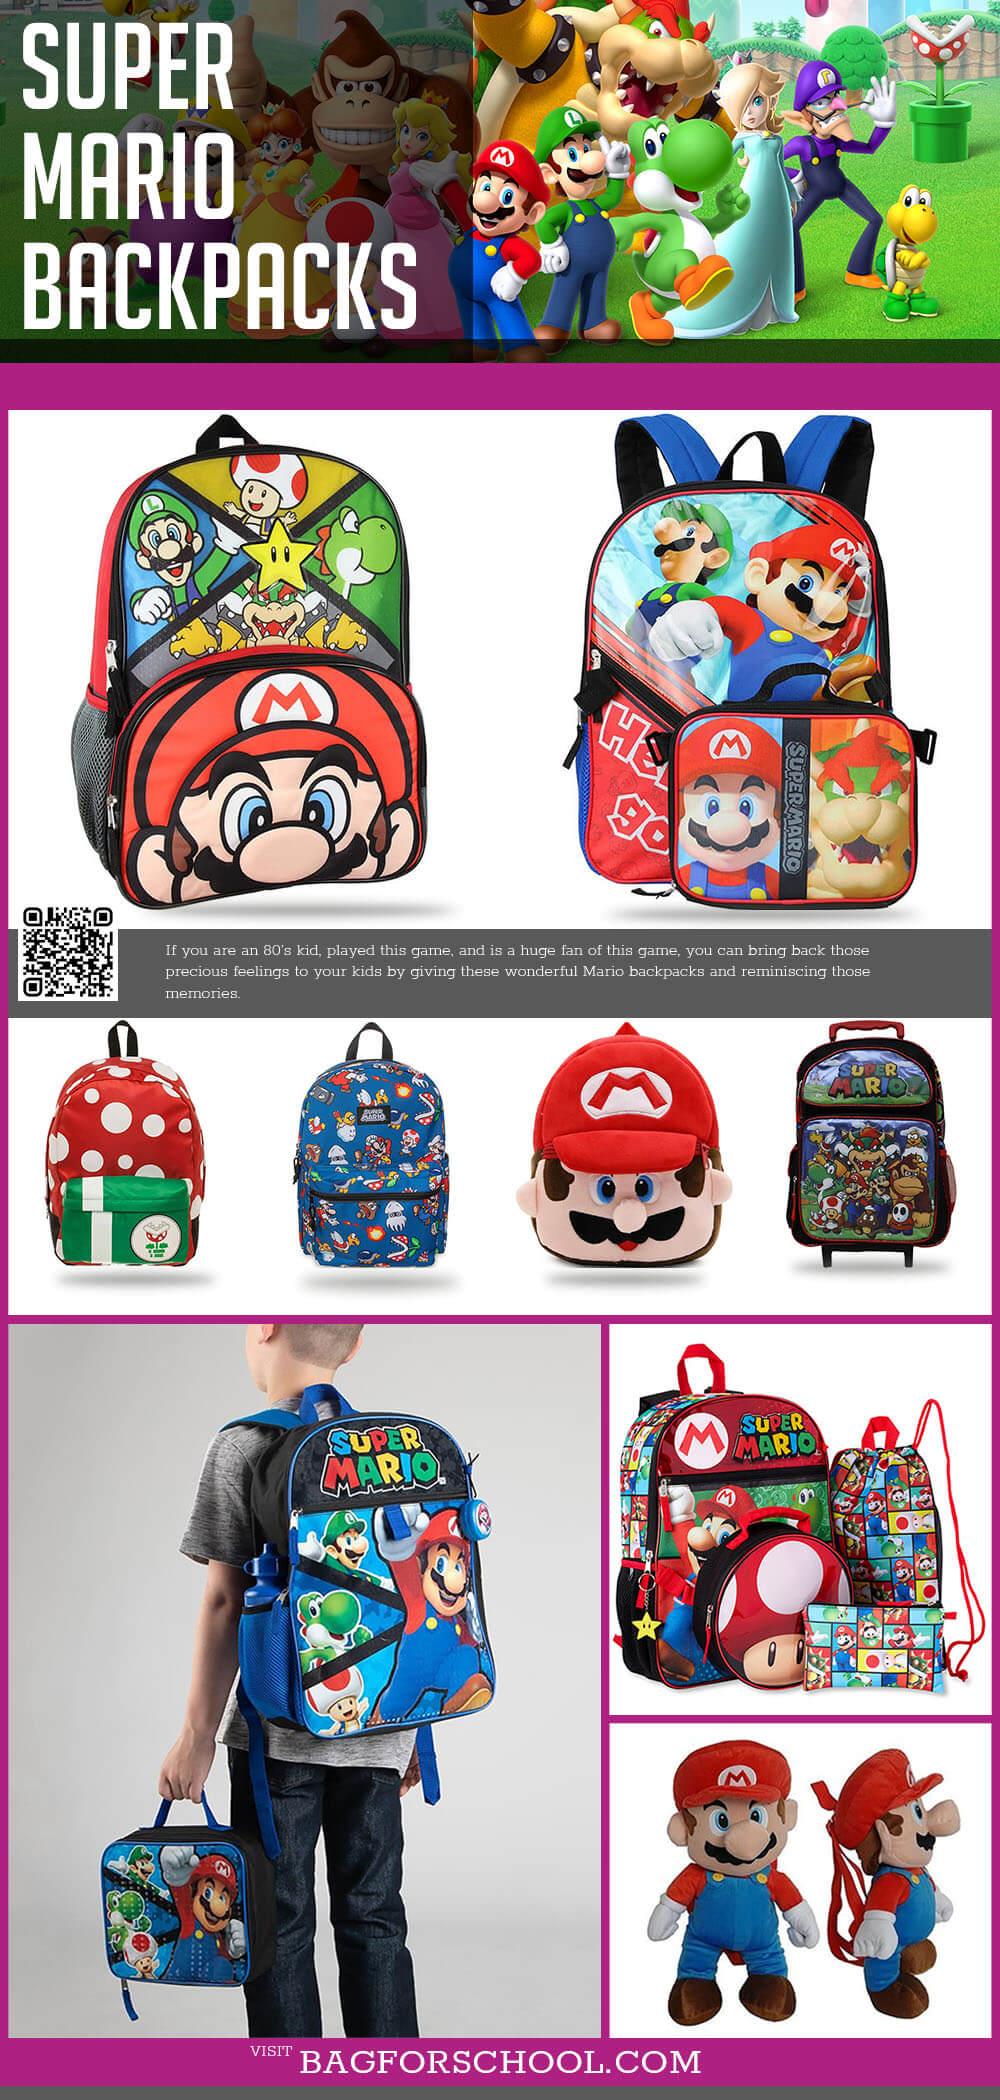 Mario Backpacks